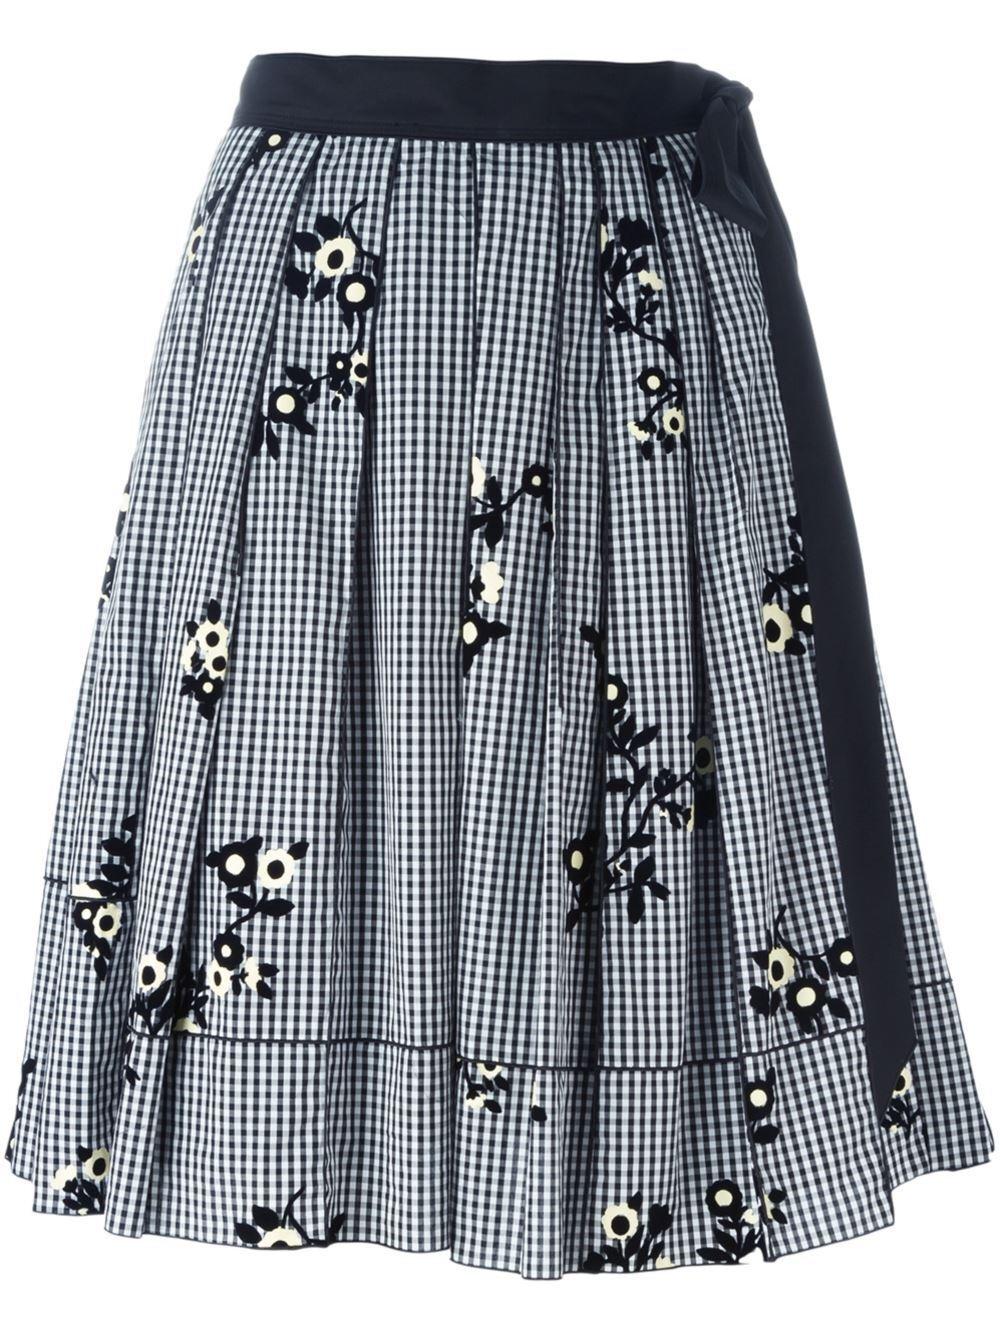 MARC JACOBS Floral Gingham Skirt Mult Sz  625.00